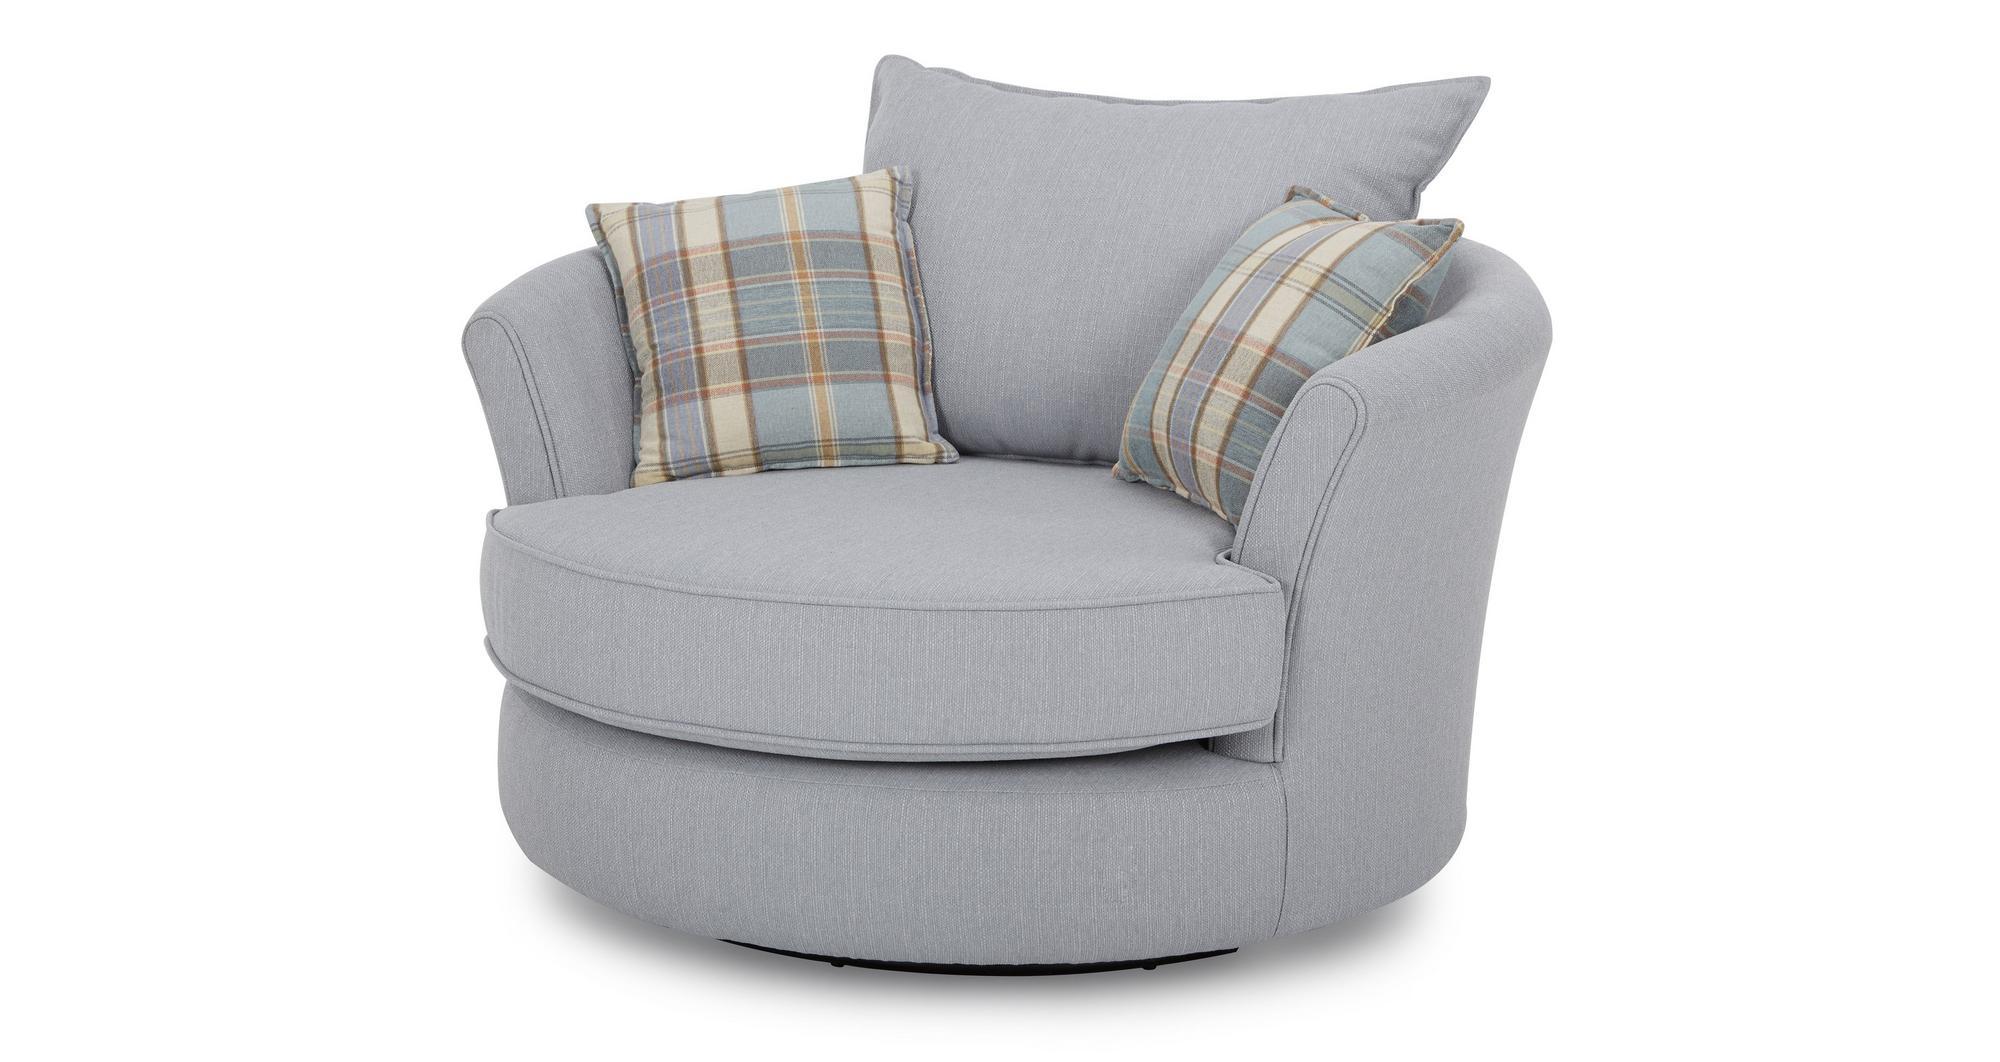 dfs jasper blue fabric swivel chair half moon footstool set ebay. Black Bedroom Furniture Sets. Home Design Ideas